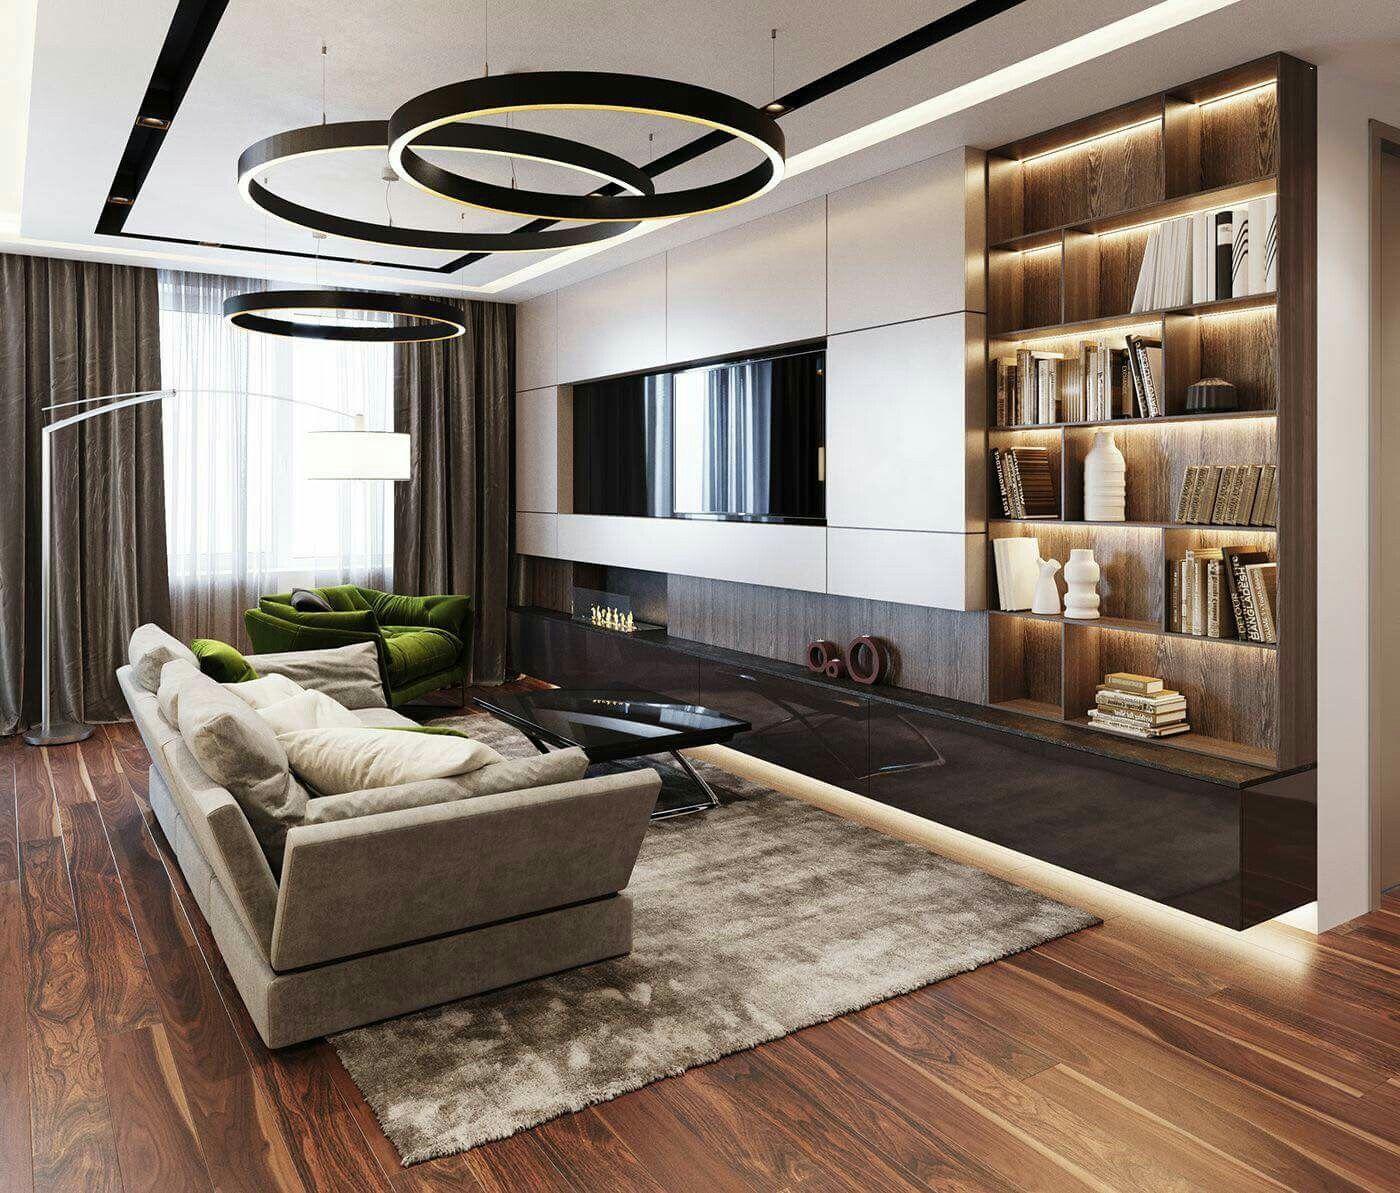 Pin de Renkli Kalpler en Ev-Tv ünitesi-tv wall fireplace | Pinterest ...